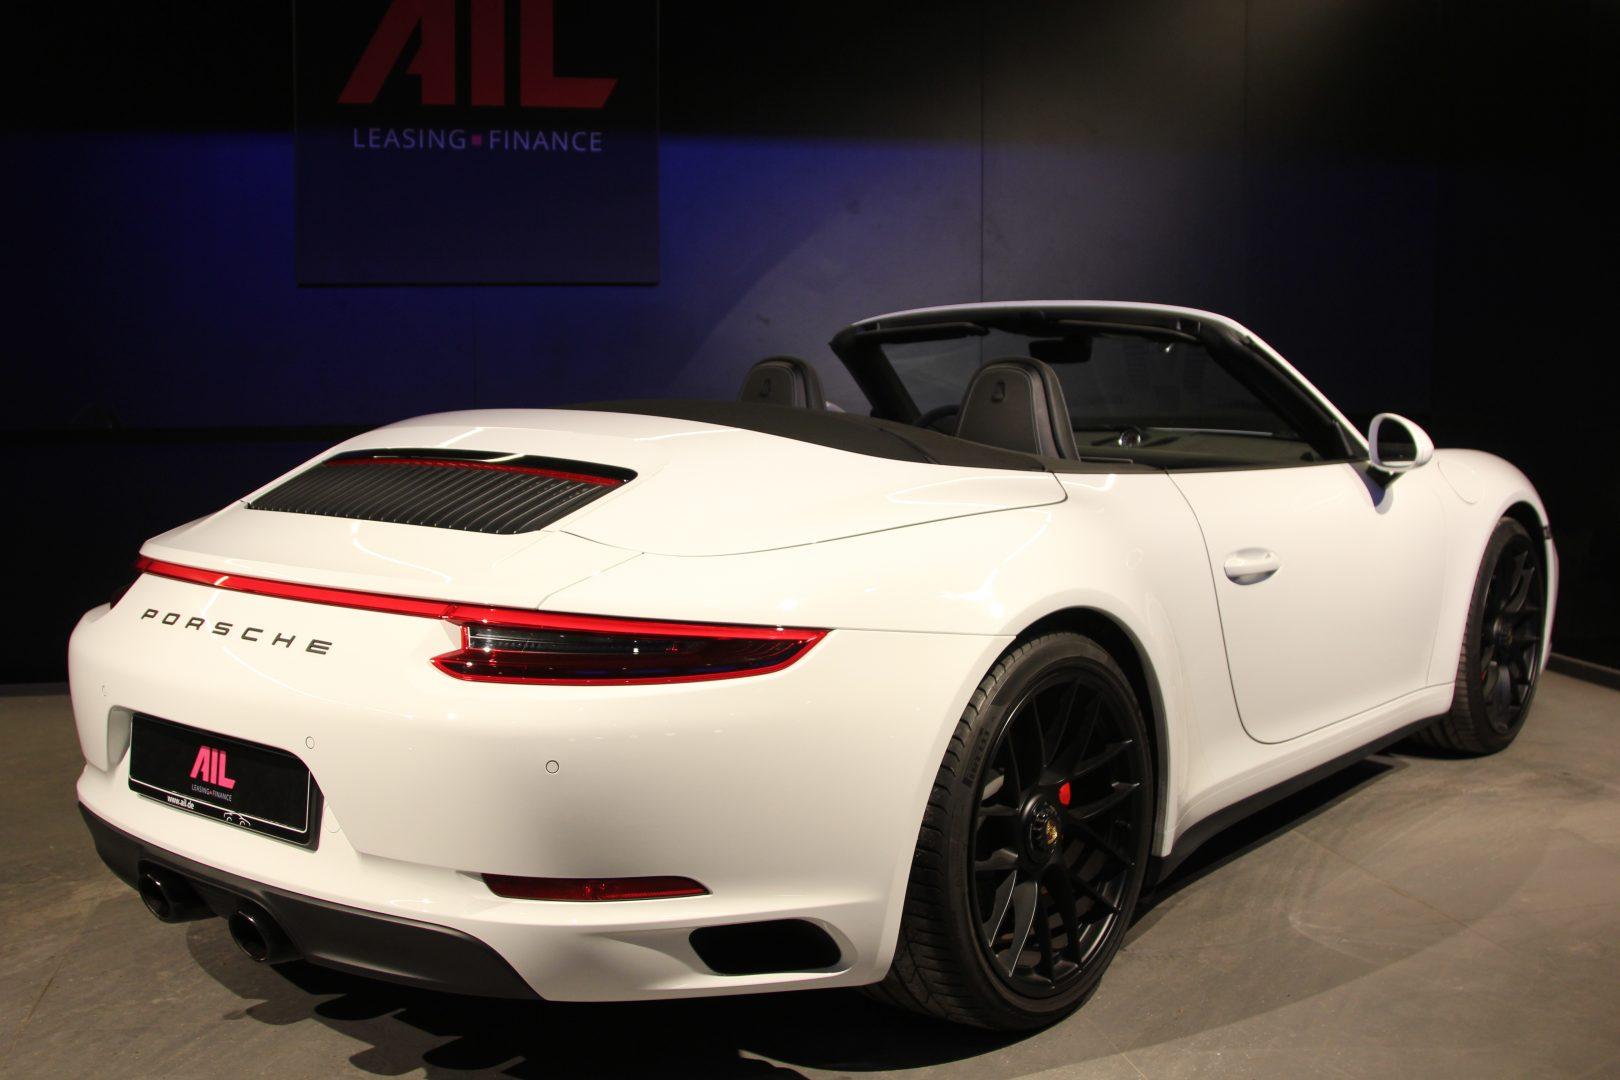 AIL Porsche 911 991 Carrera 4 GTS  2